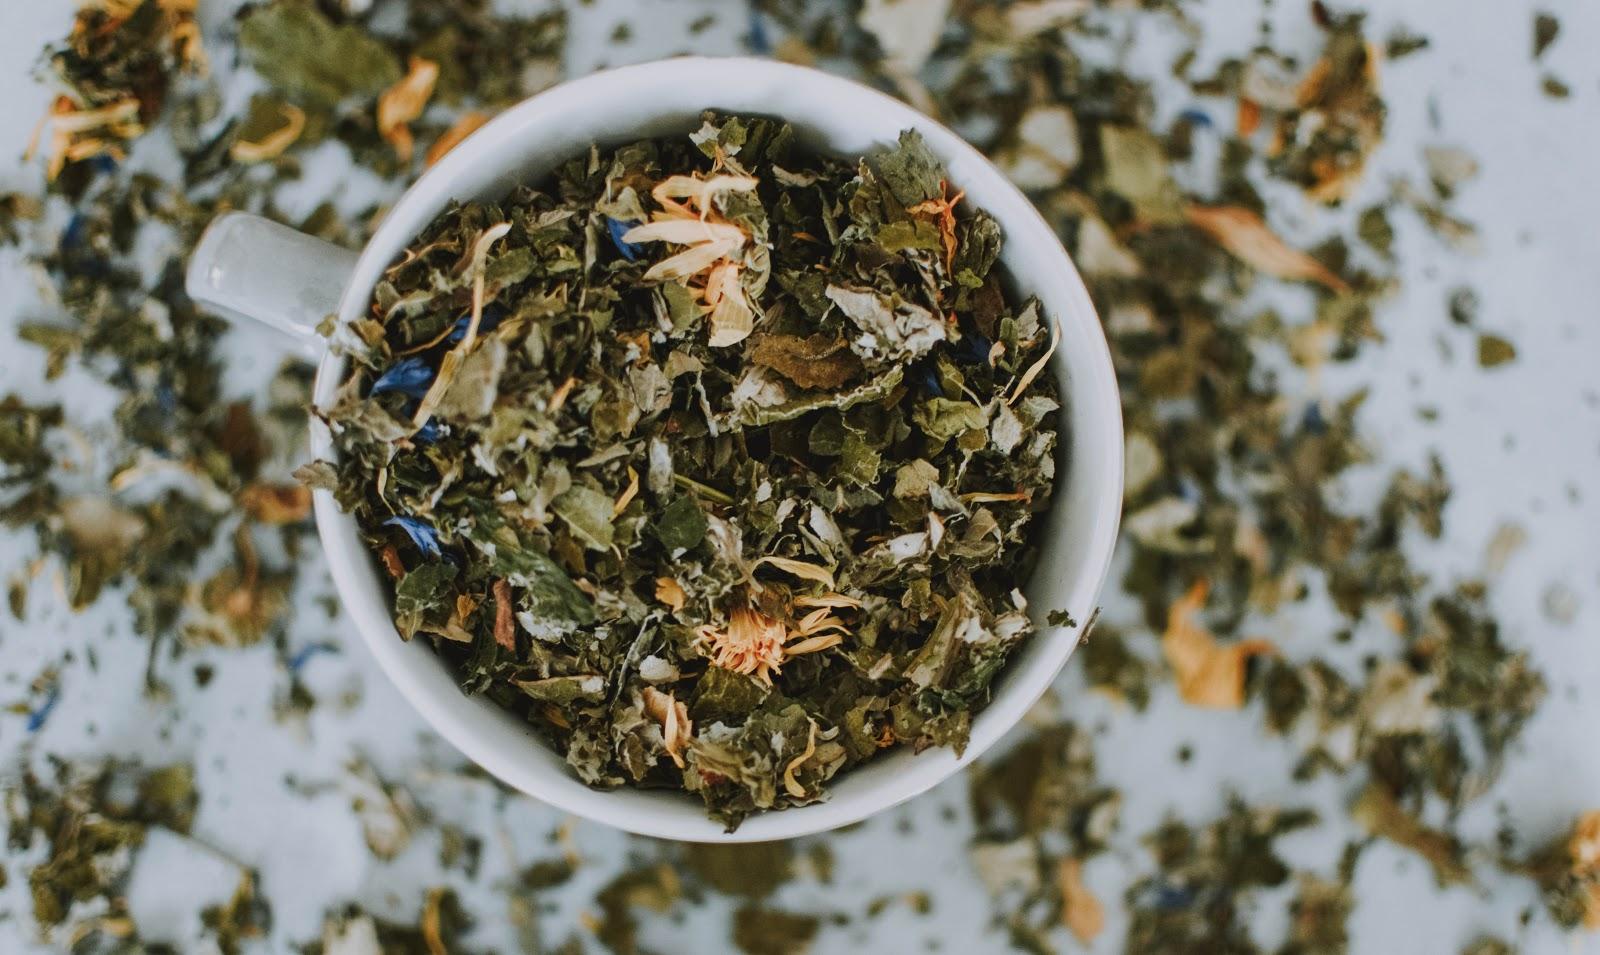 Variety Of Teas Explained